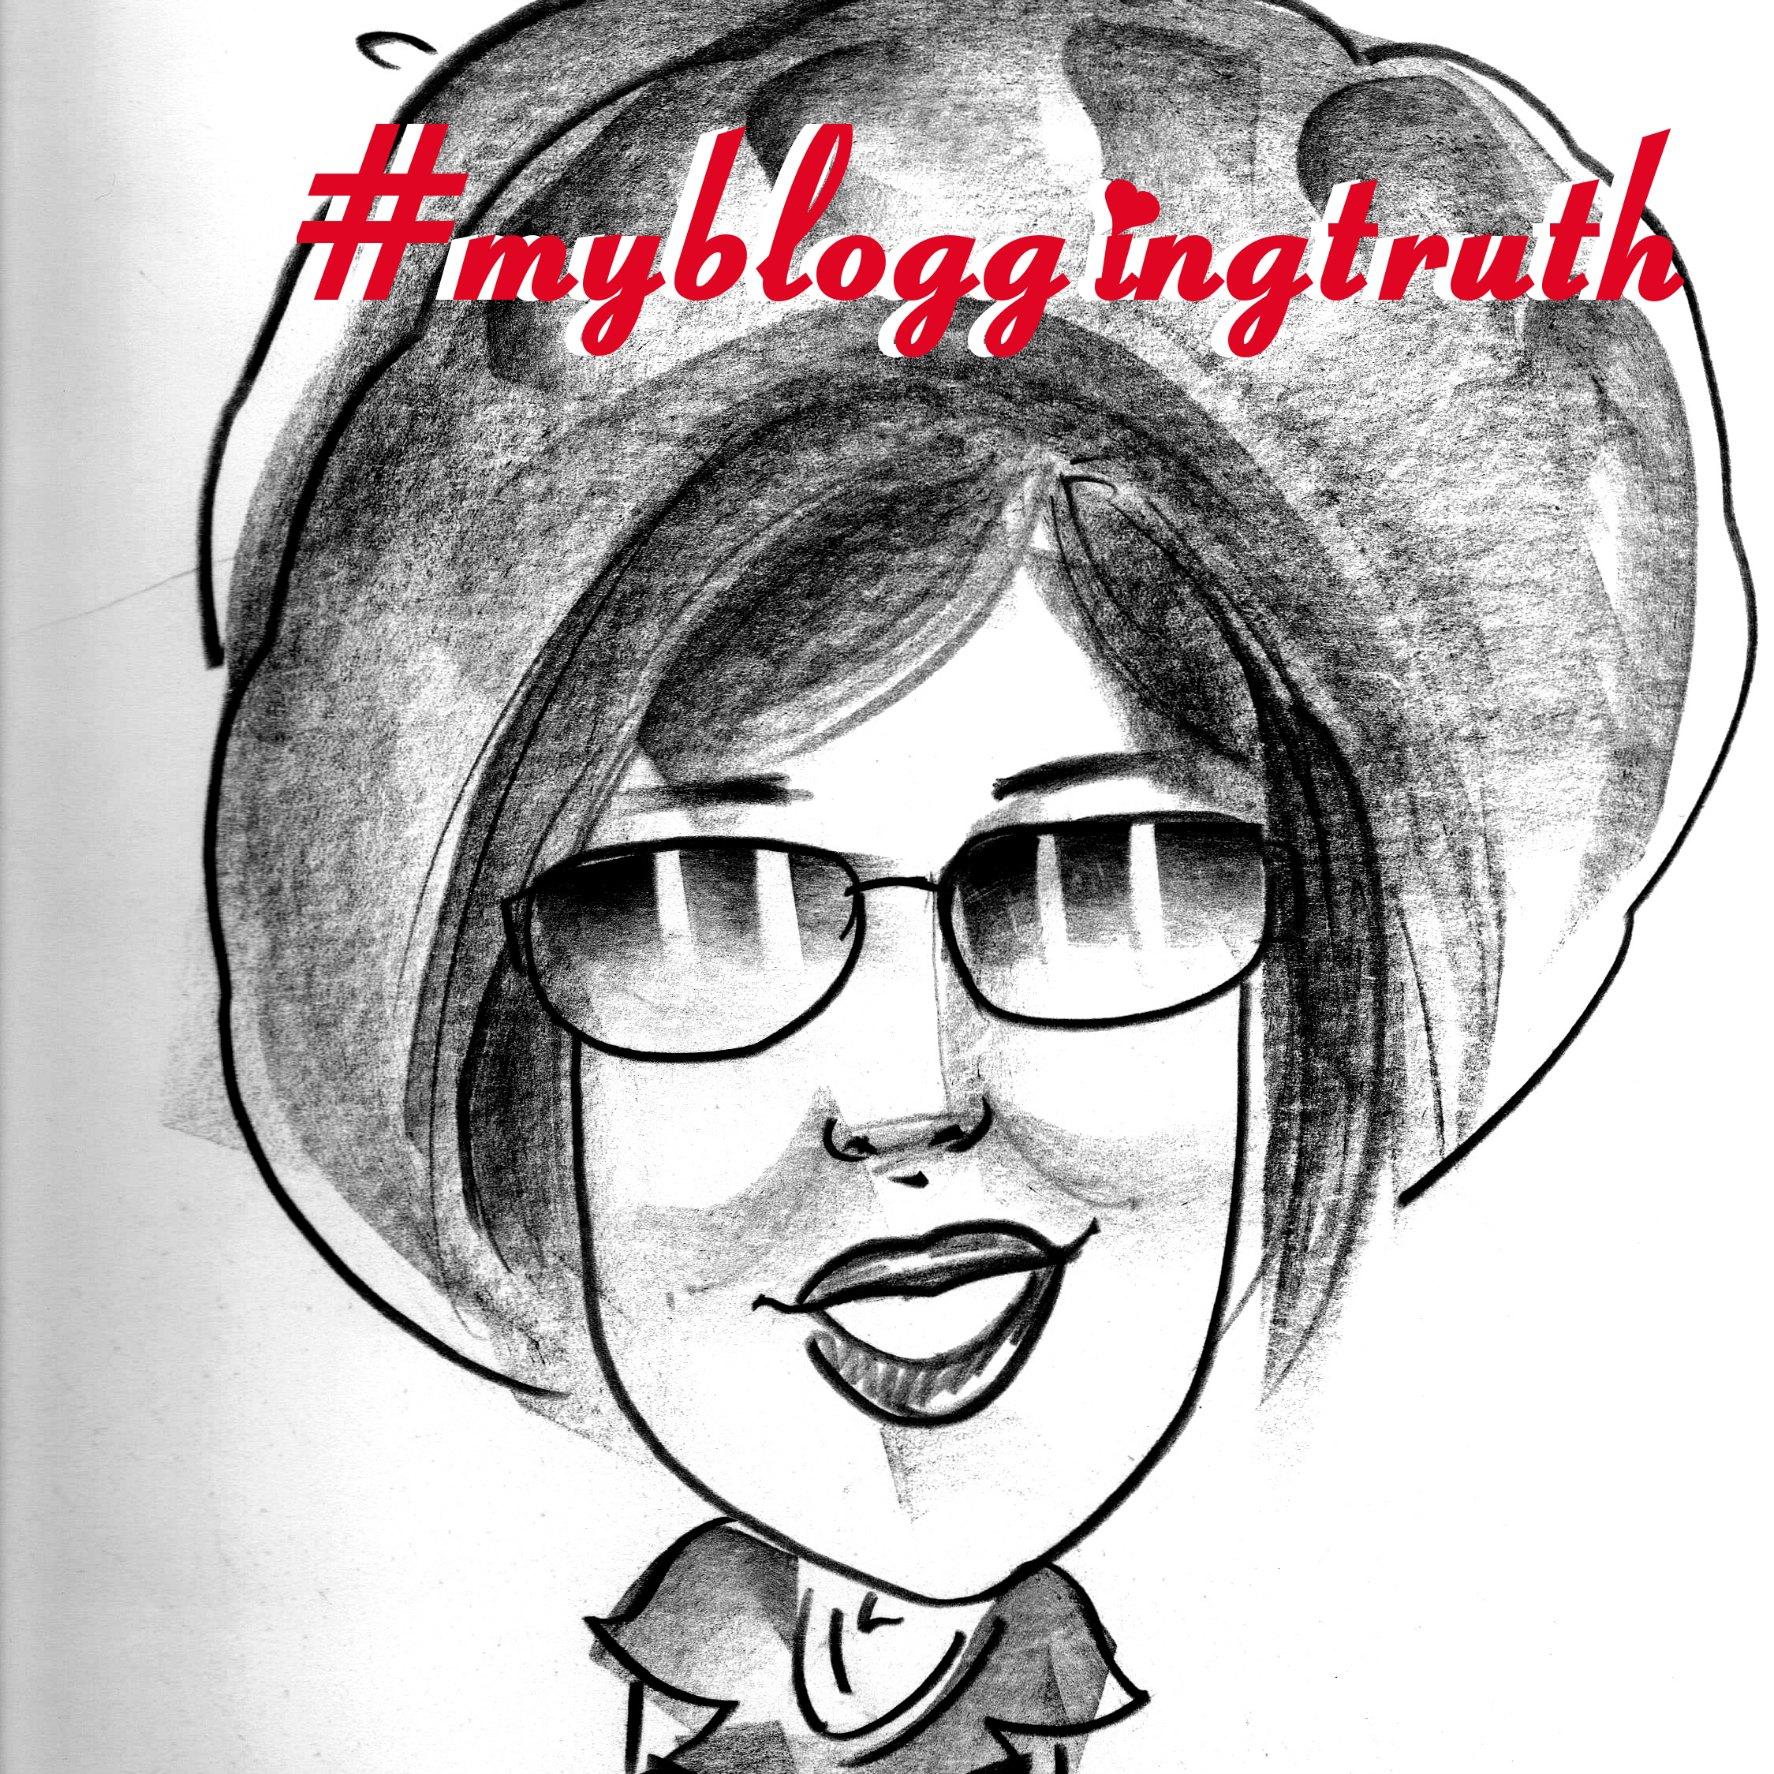 #mybloggingtruth: Perfect Bloggers